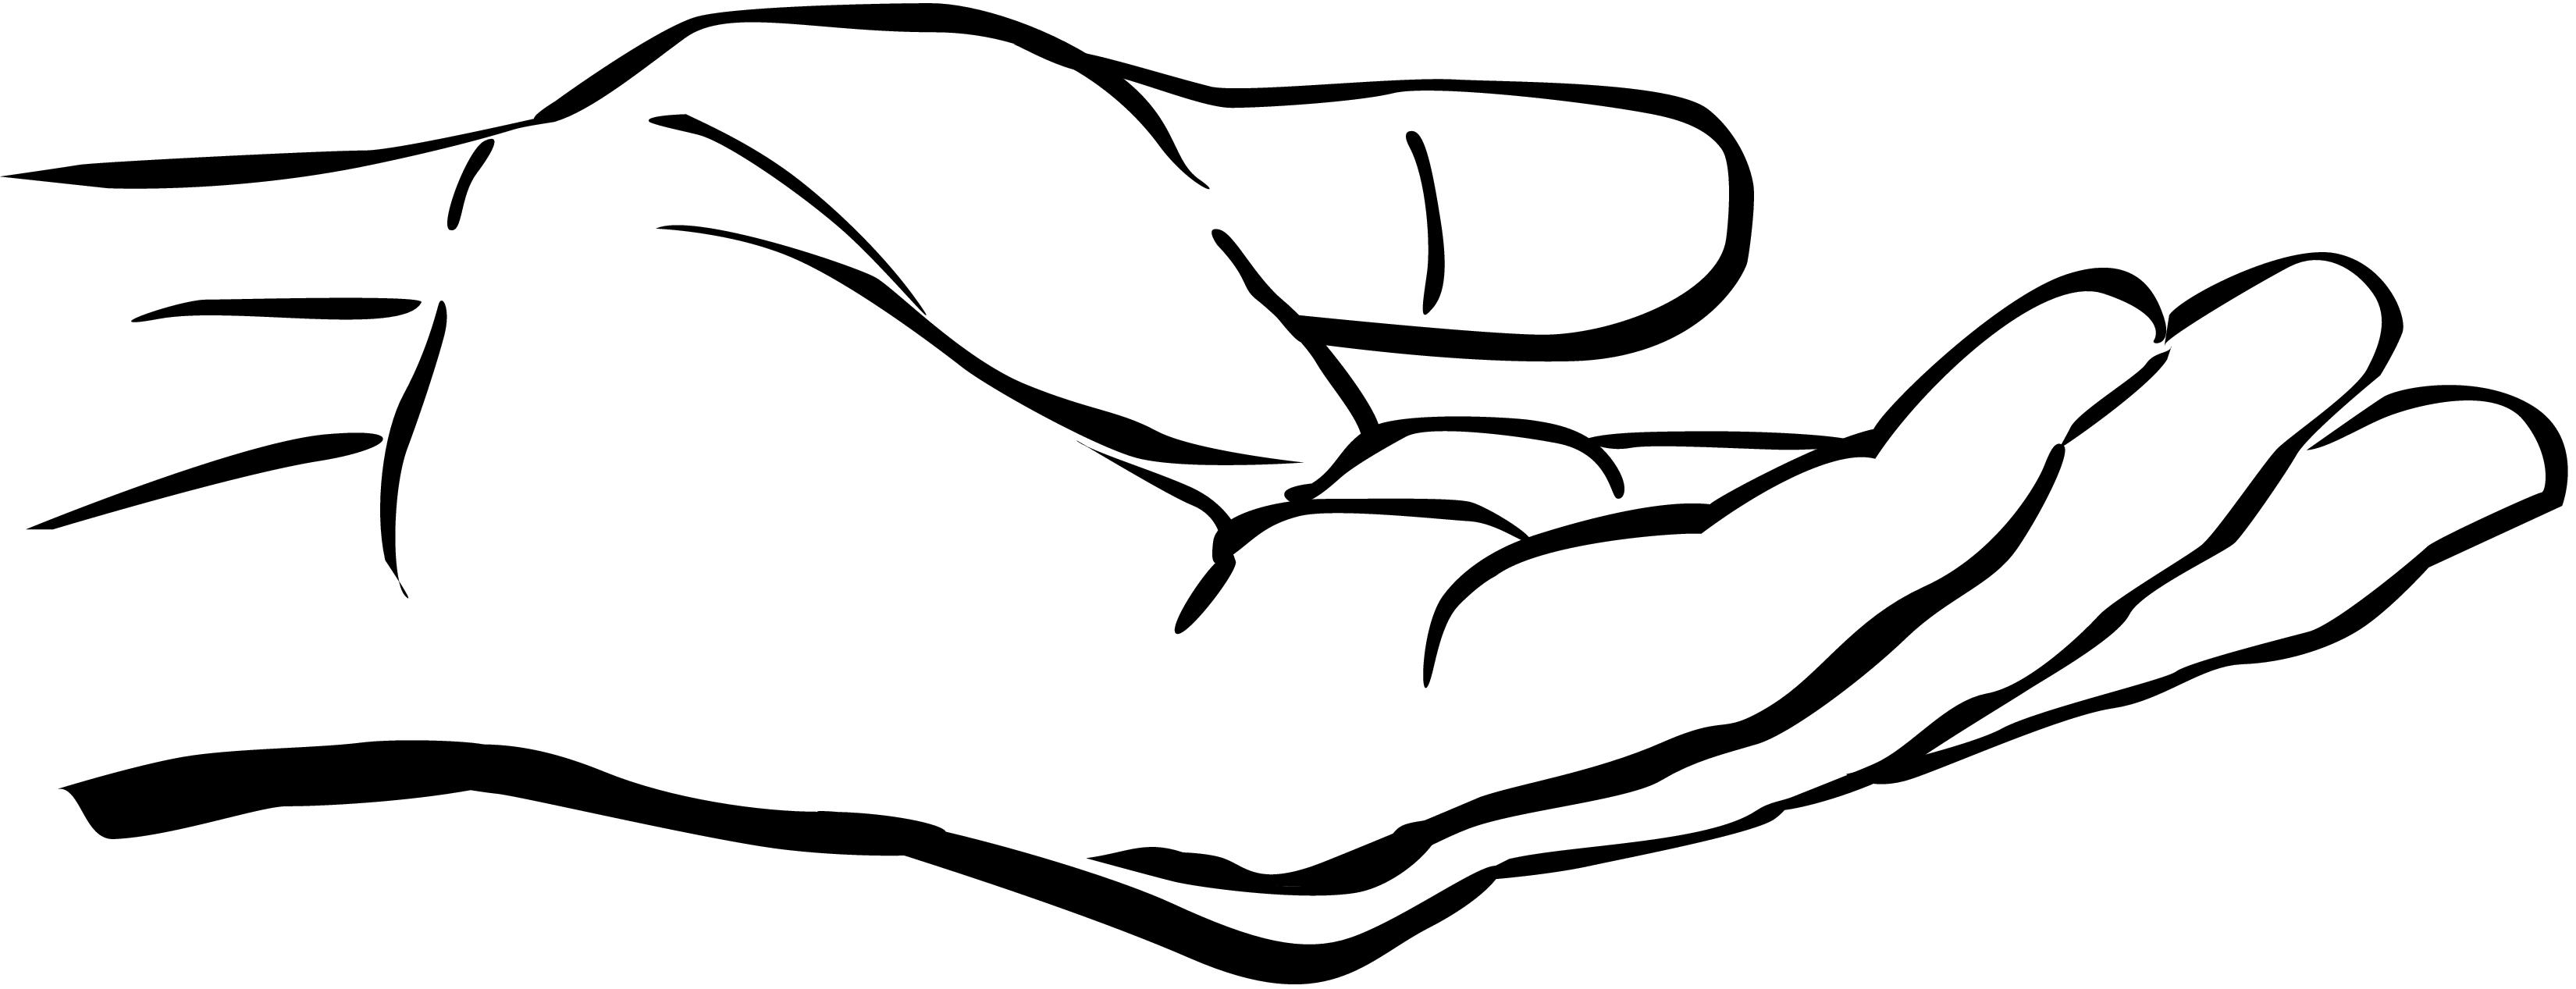 Hand Clipart-hand clipart-7